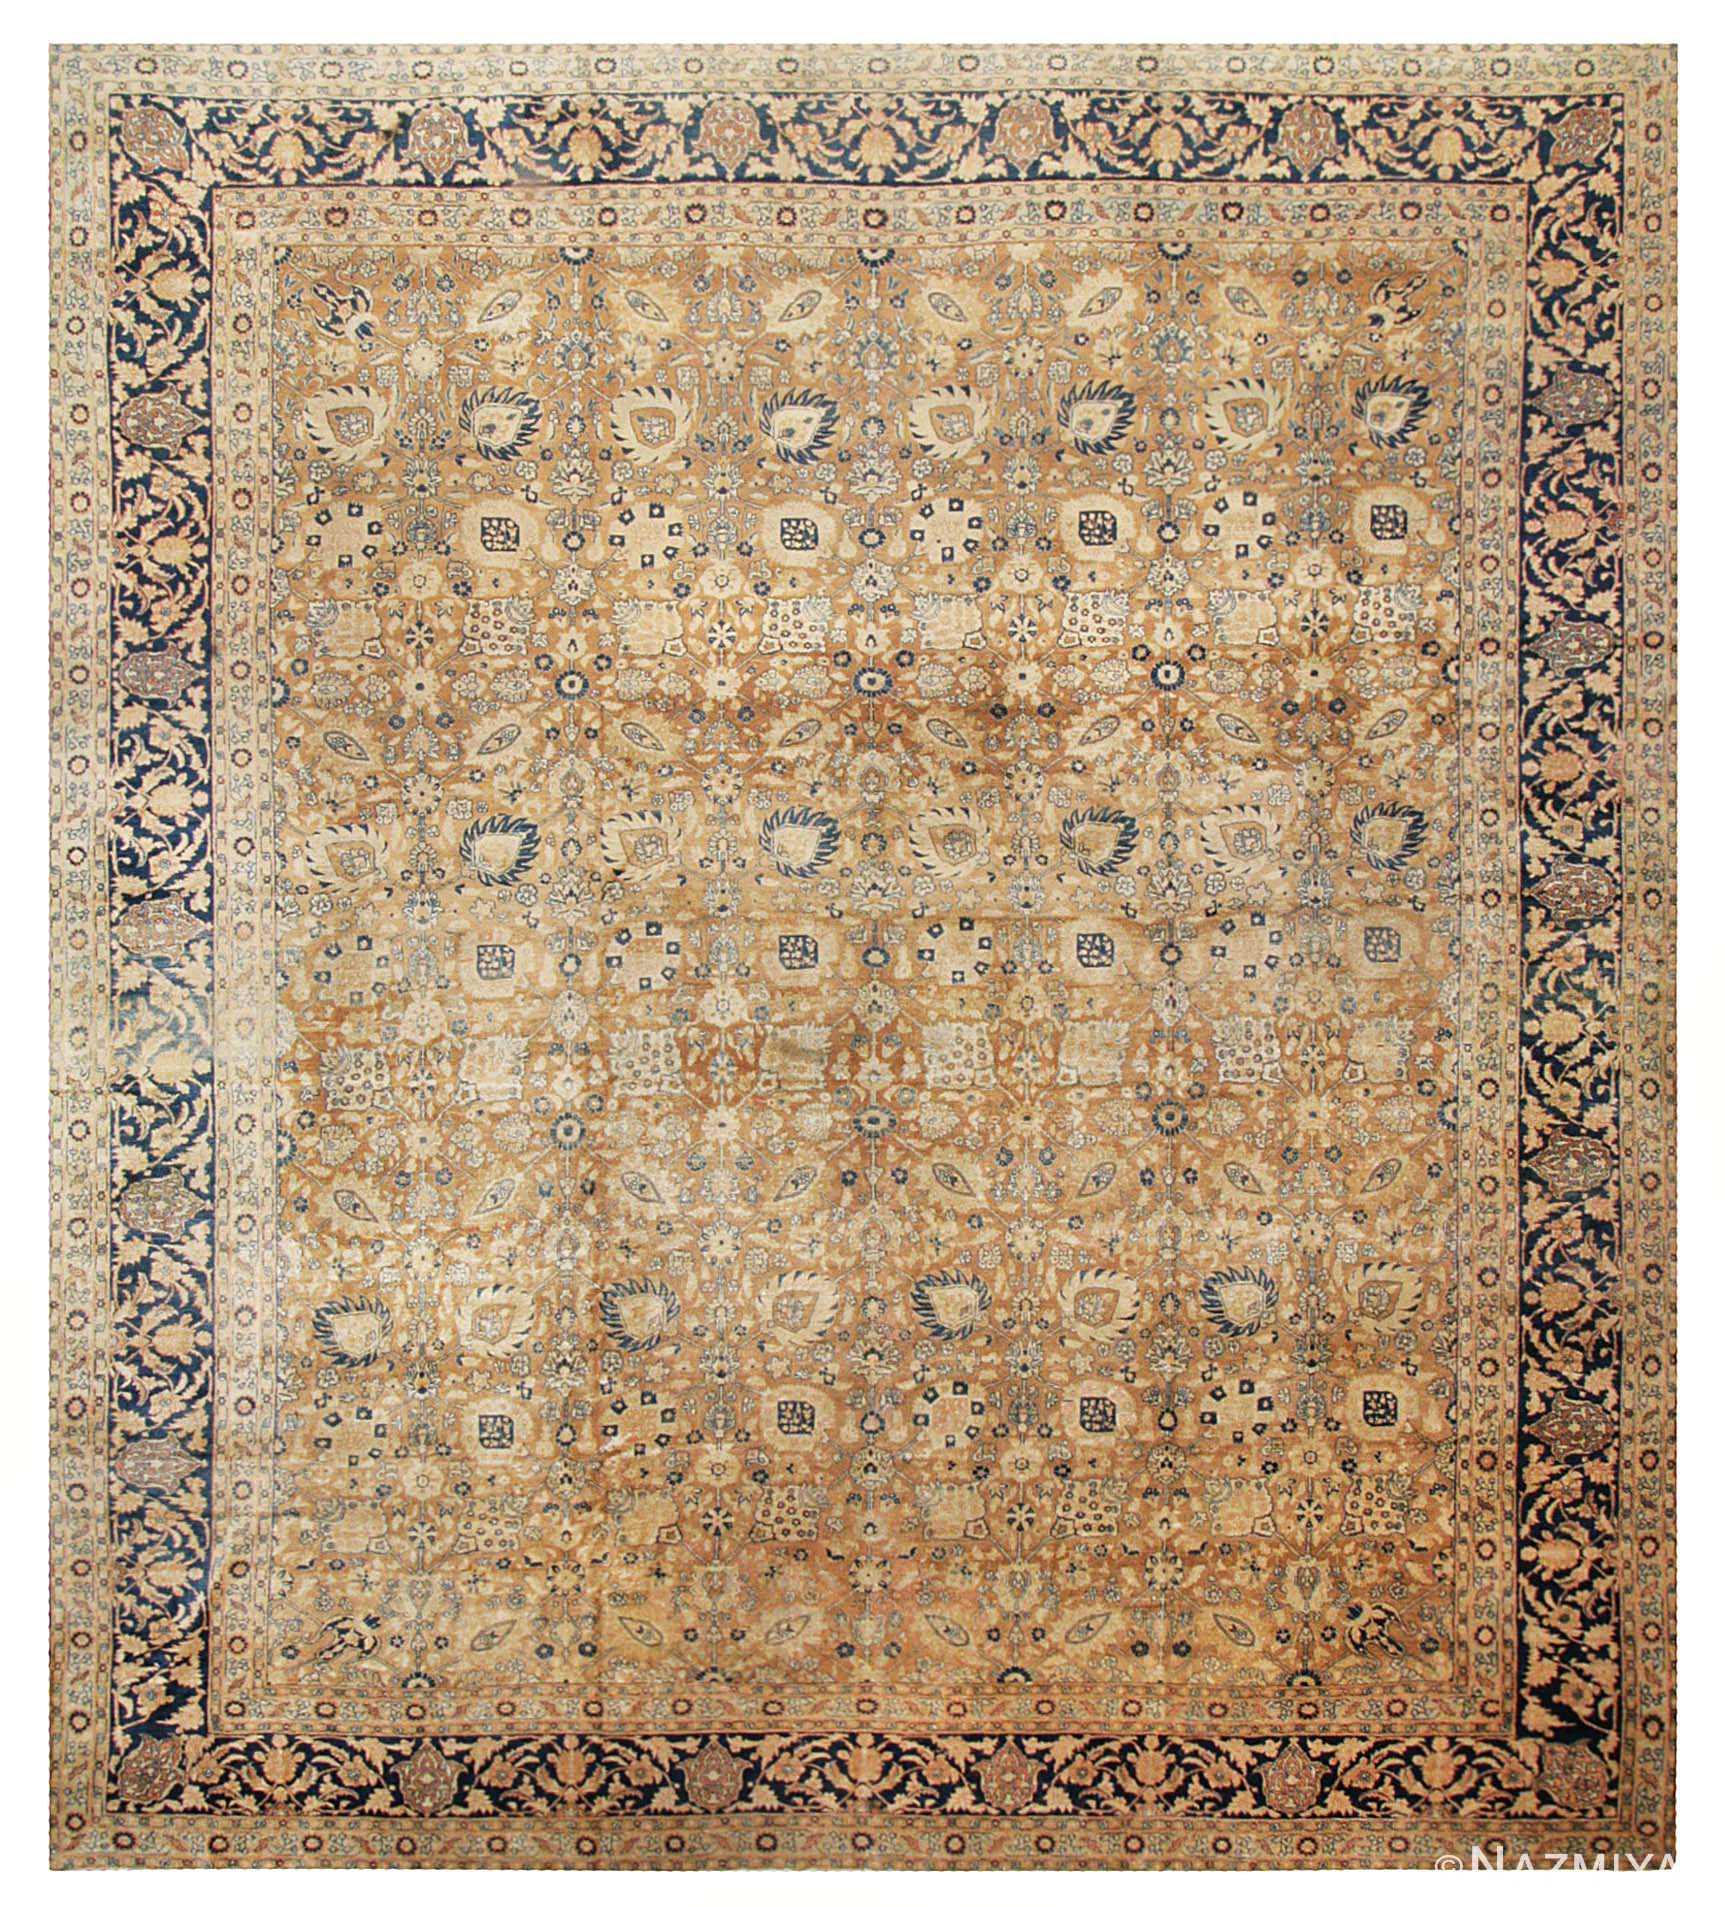 Modern Persian Tabriz Design Rug 44687 Nazmiyal Antique Rugs: Antique Persian Tabriz Rug 43396 By Nazmiyal